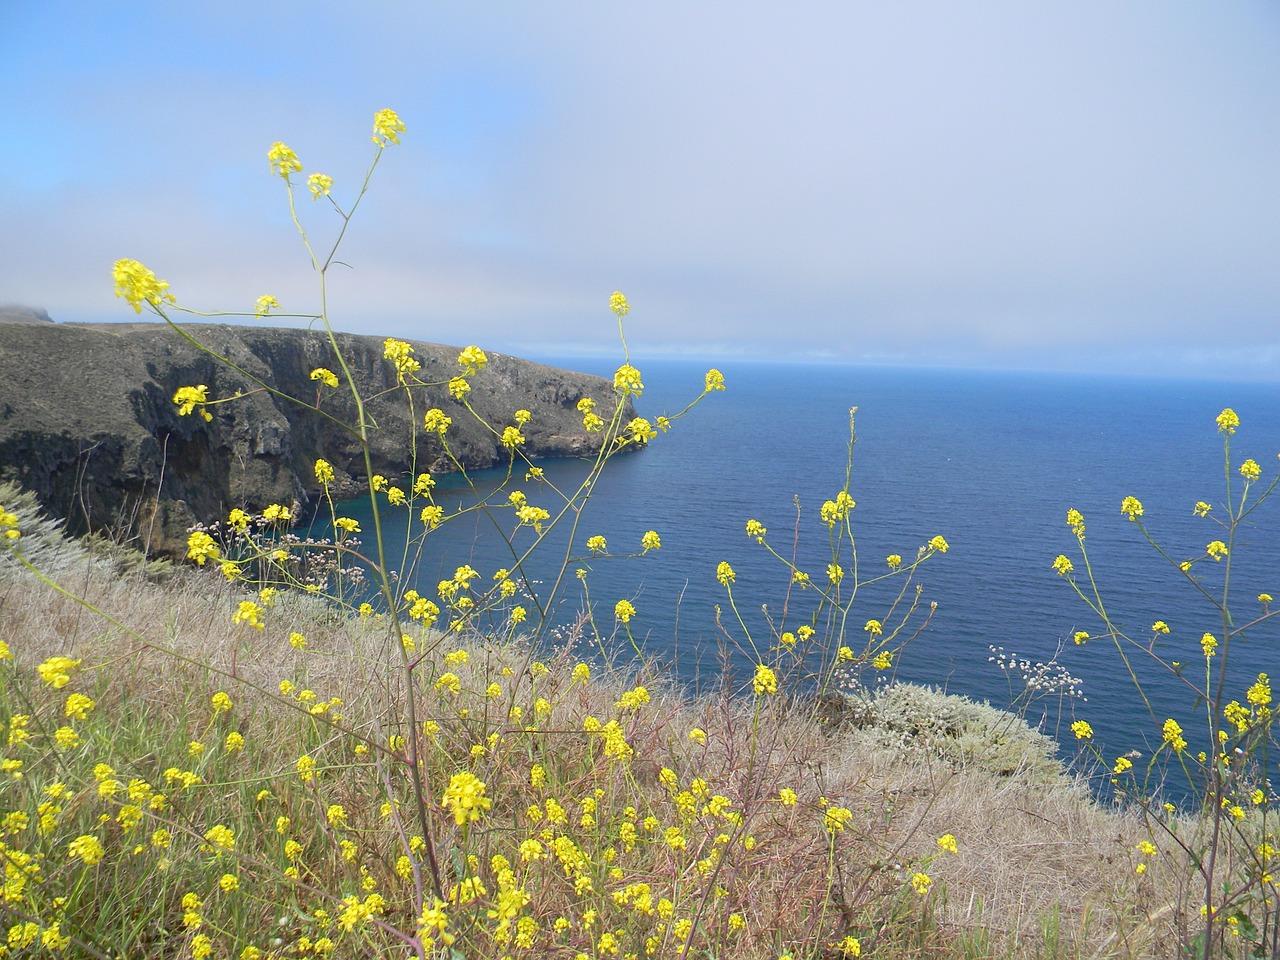 2 - channel-islands-Jersey-national-park.jpg